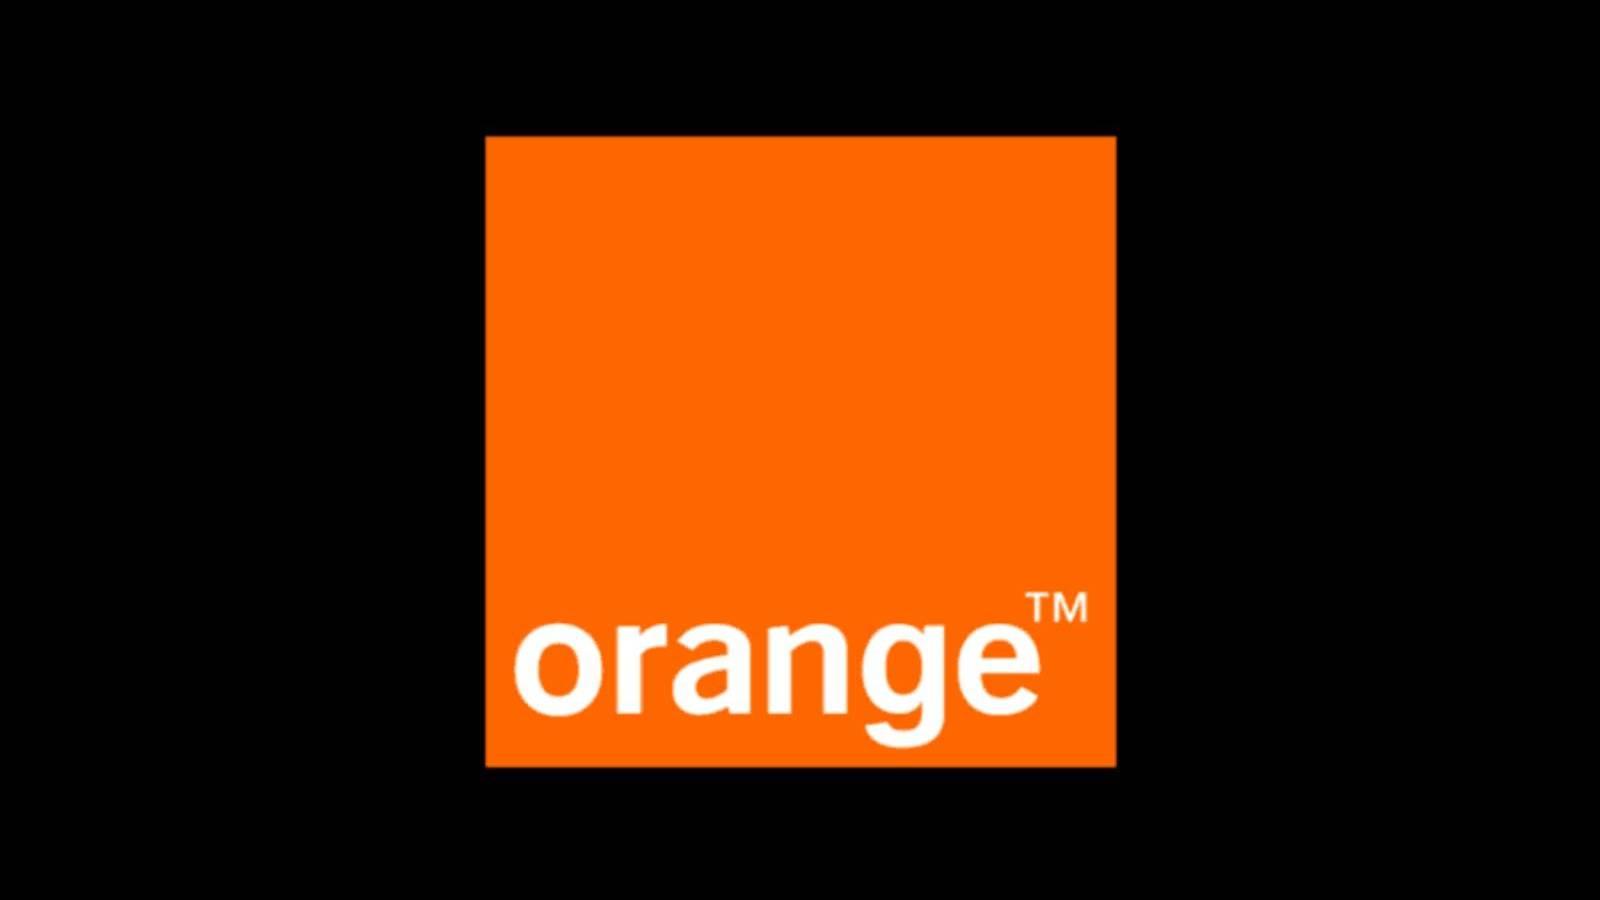 Orange tentative